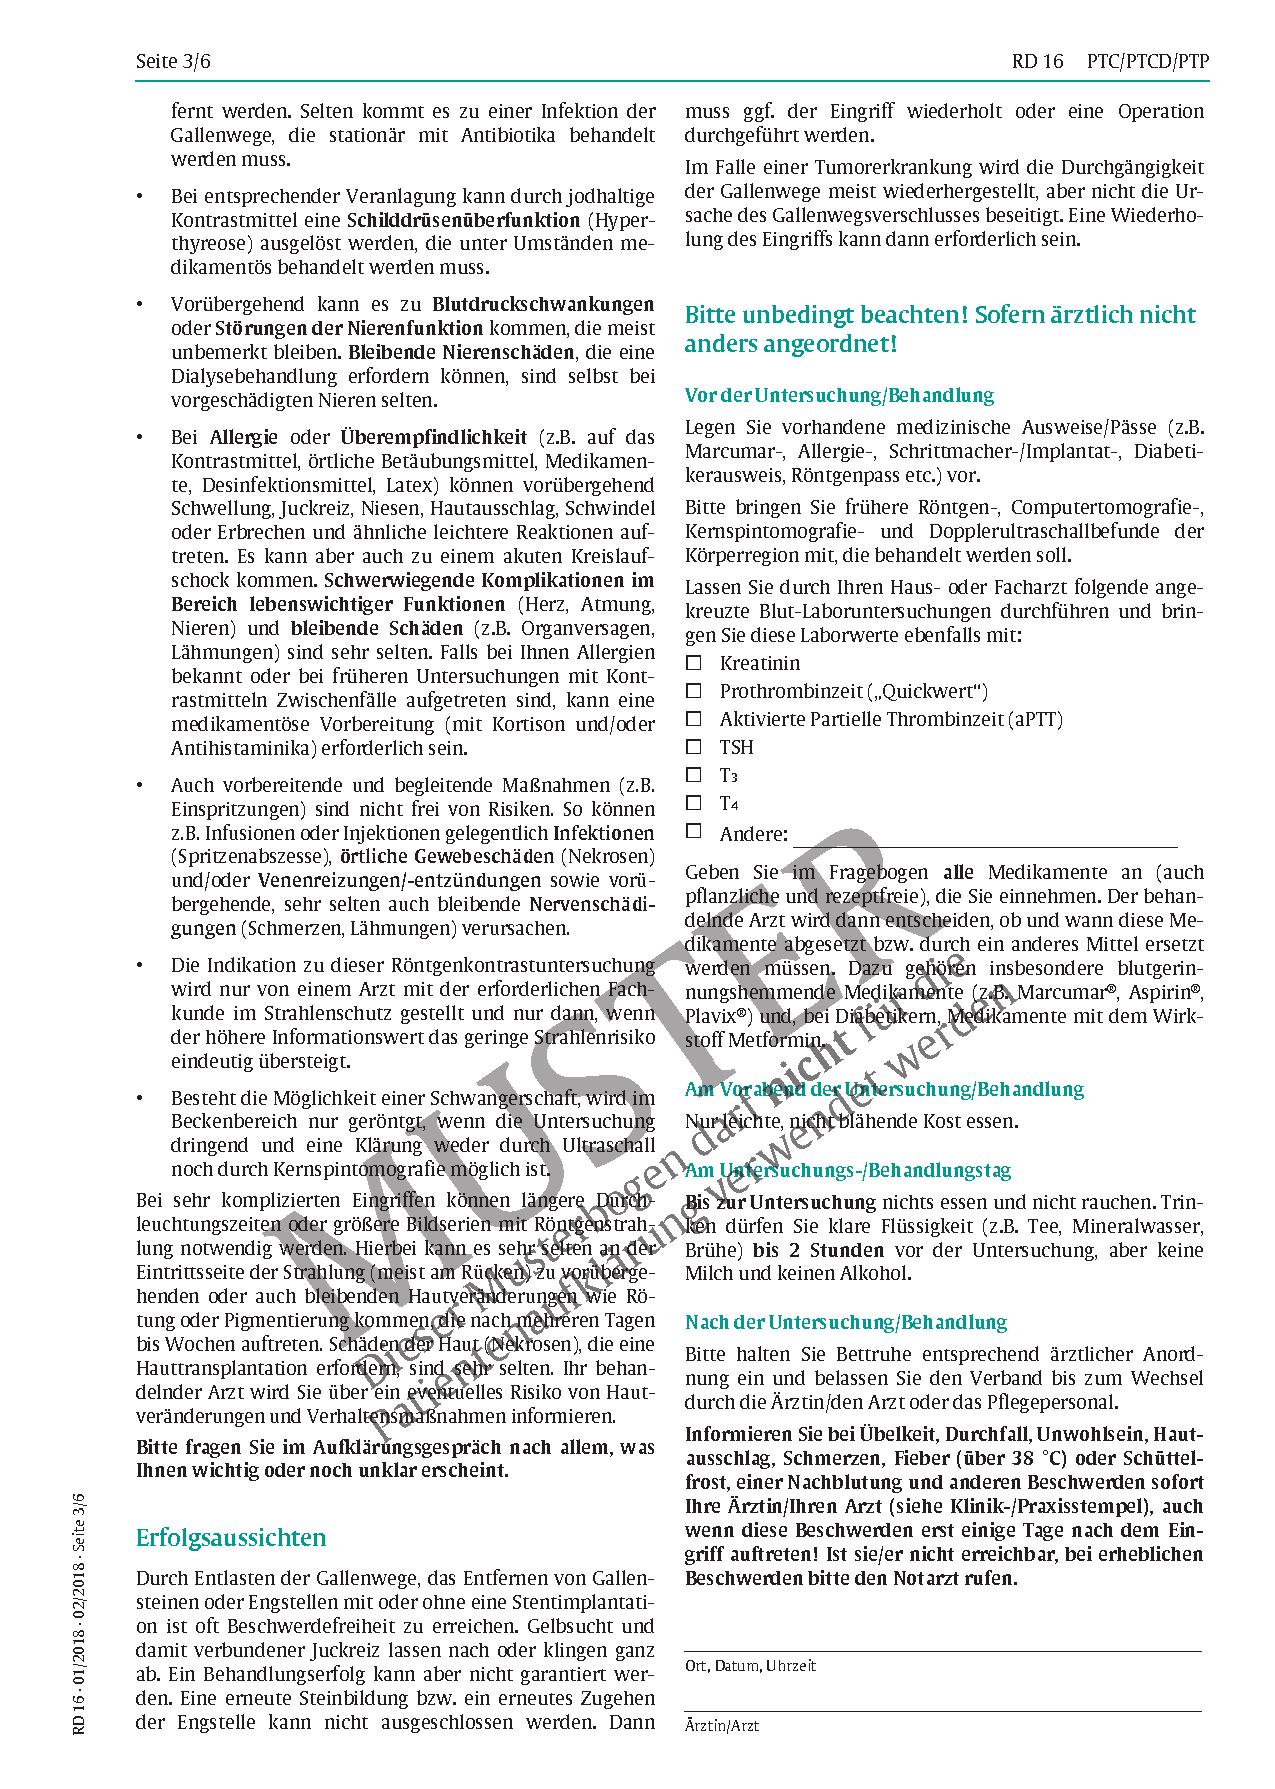 Großzügig Pfortader Fotos - Anatomie Ideen - finotti.info